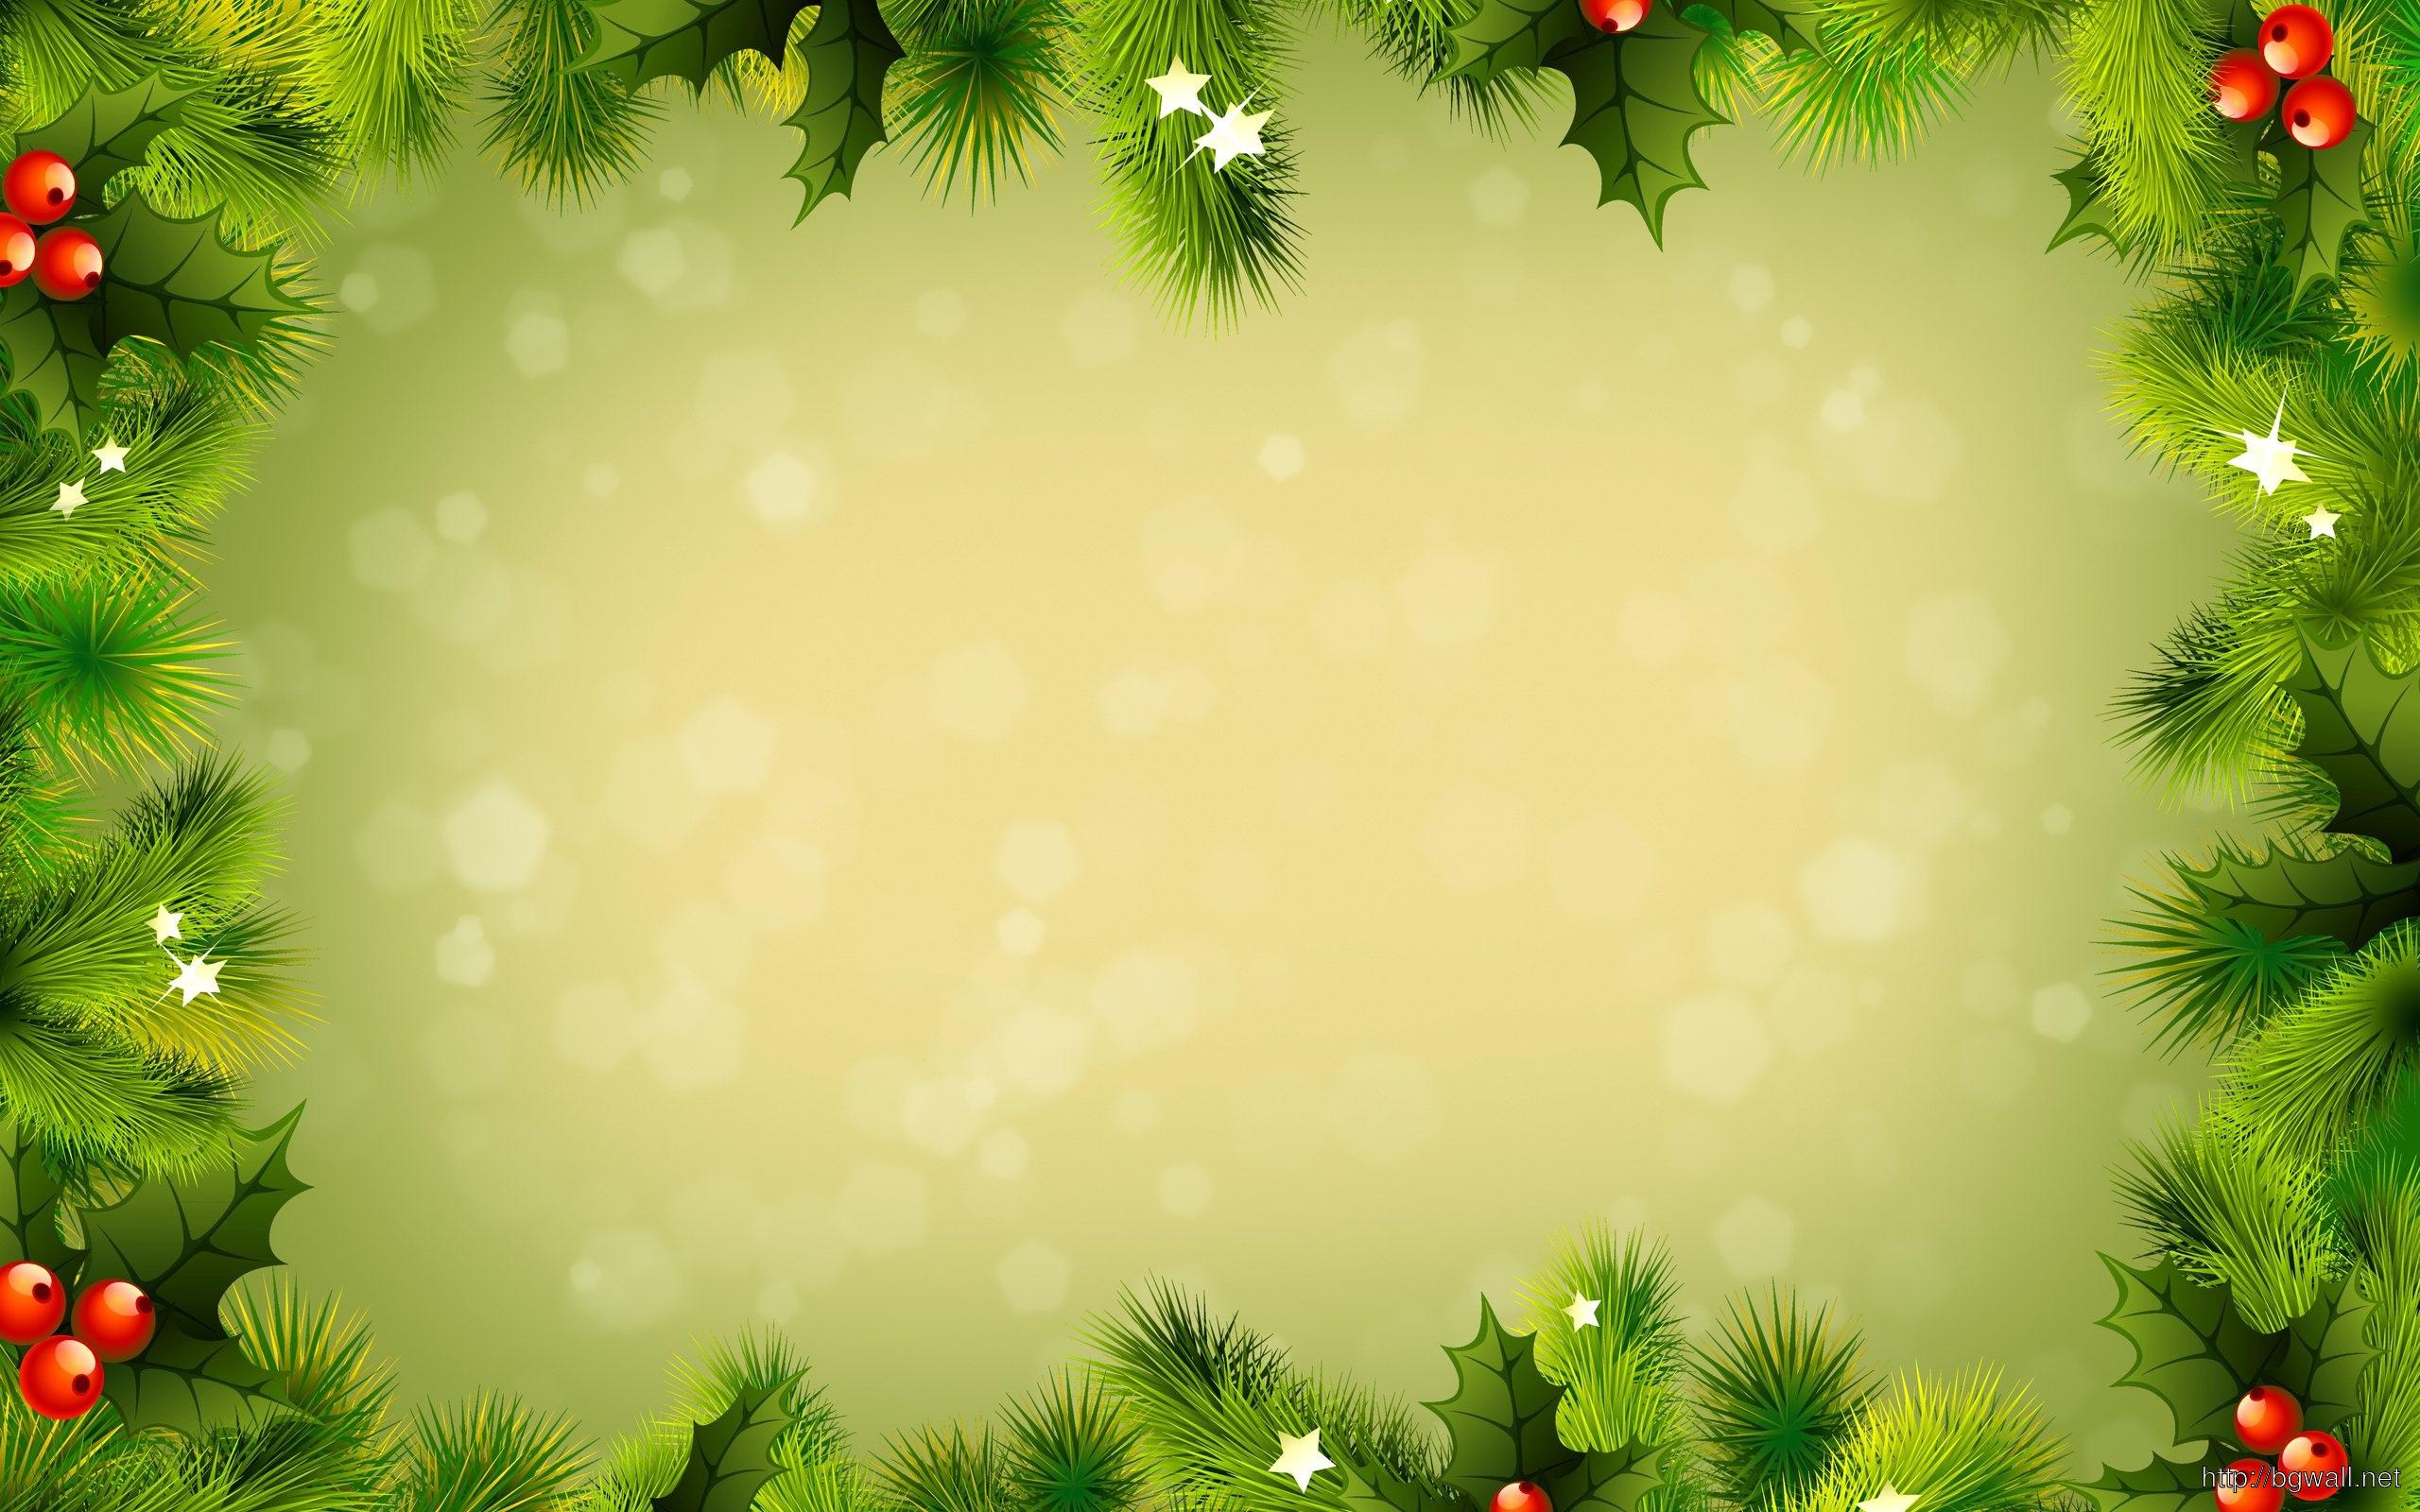 Christmas Background Wallpaper Background Wallpaper HD 2560x1600